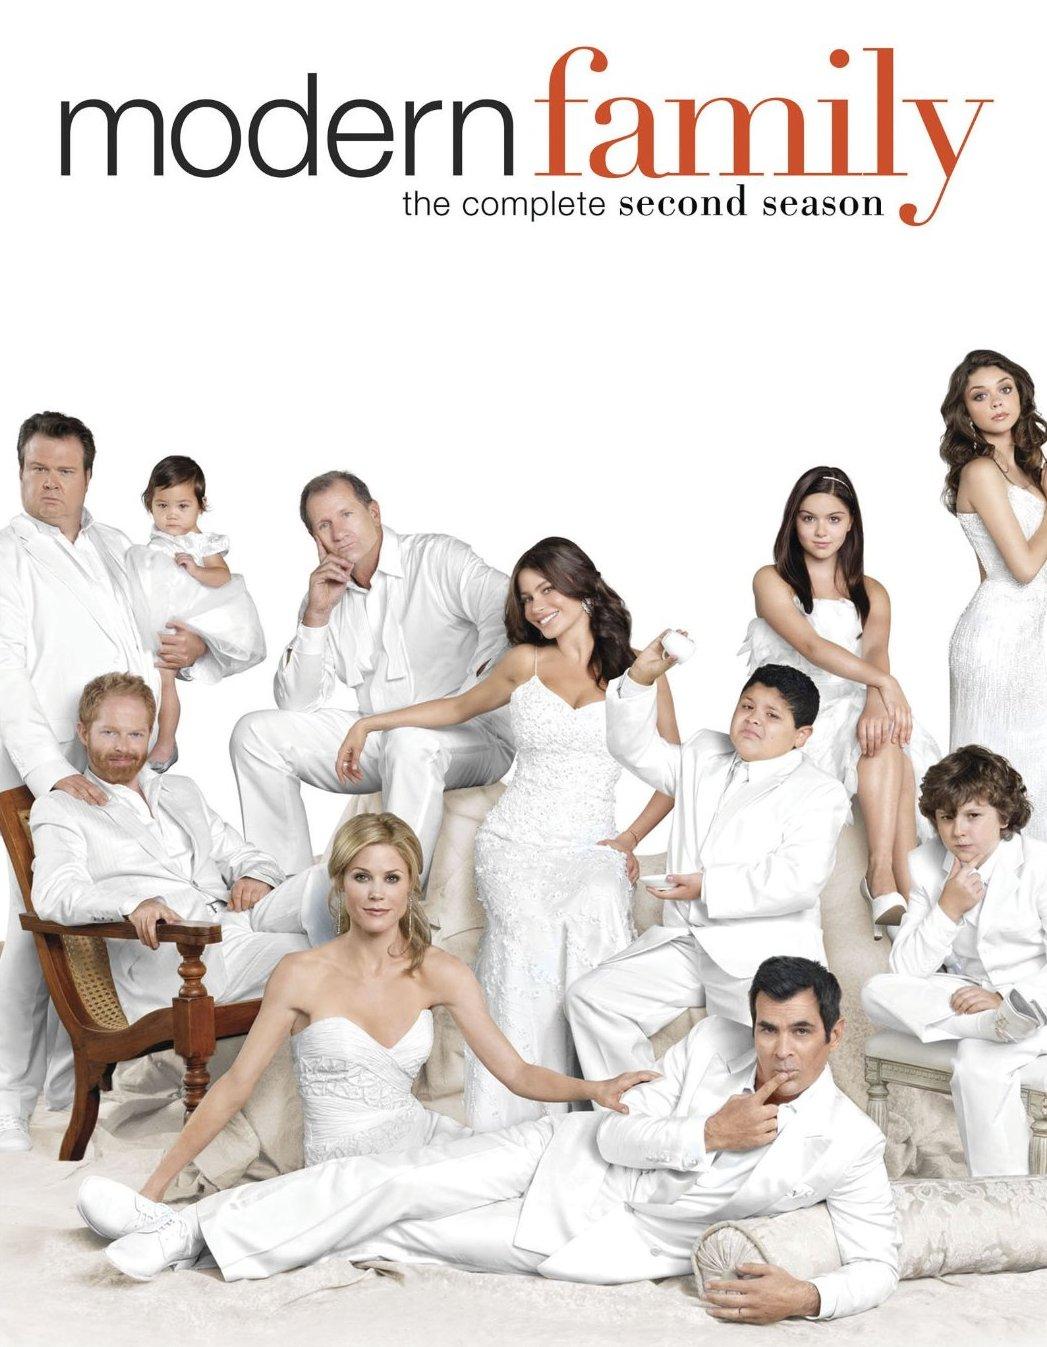 modern family season 2 169 2011 fox home entertainment 171 assignment x assignment x